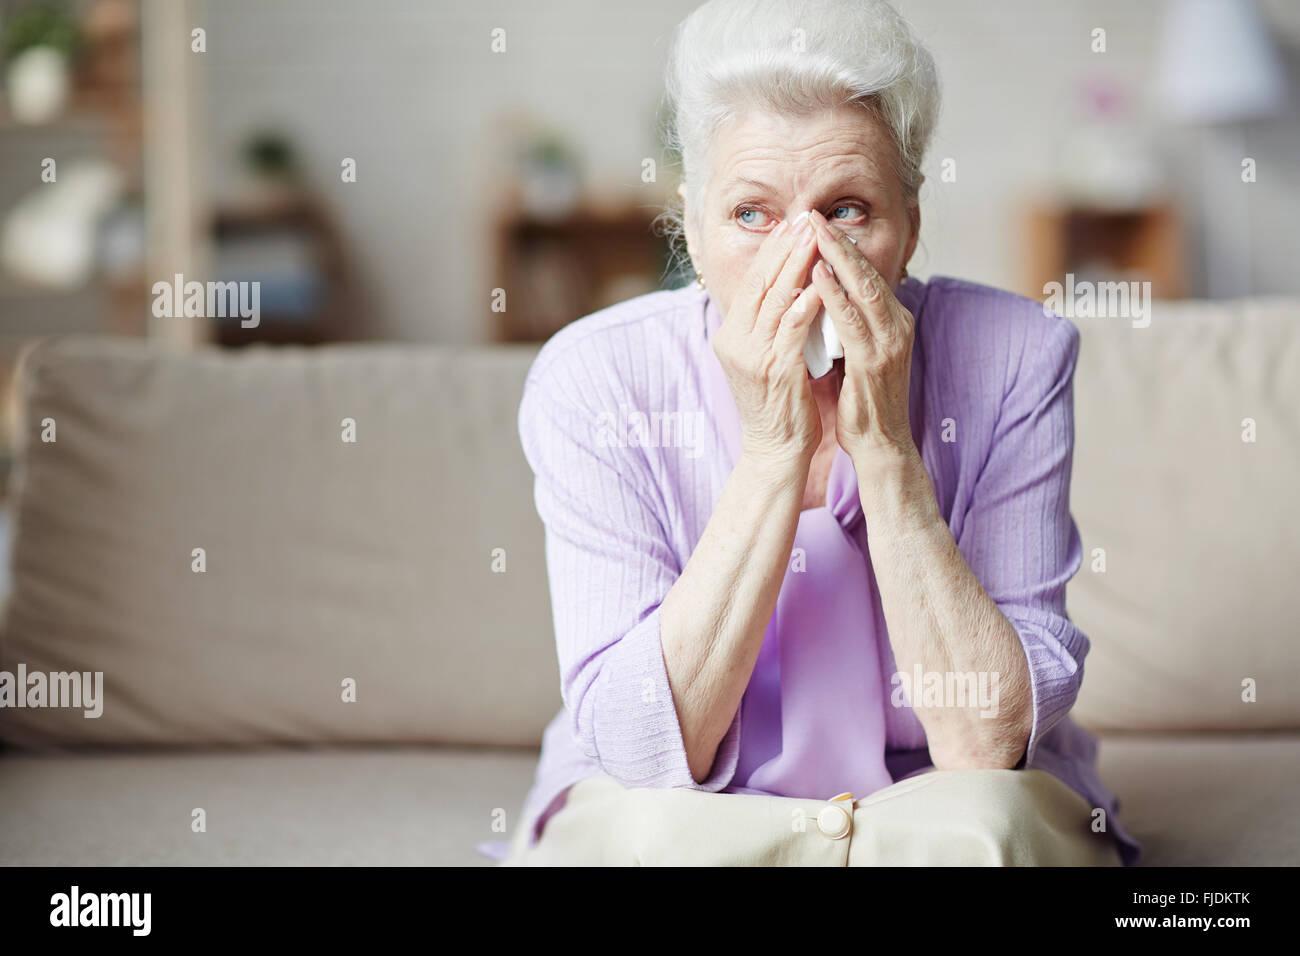 Sad senior woman sitting on sofa and crying - Stock Image